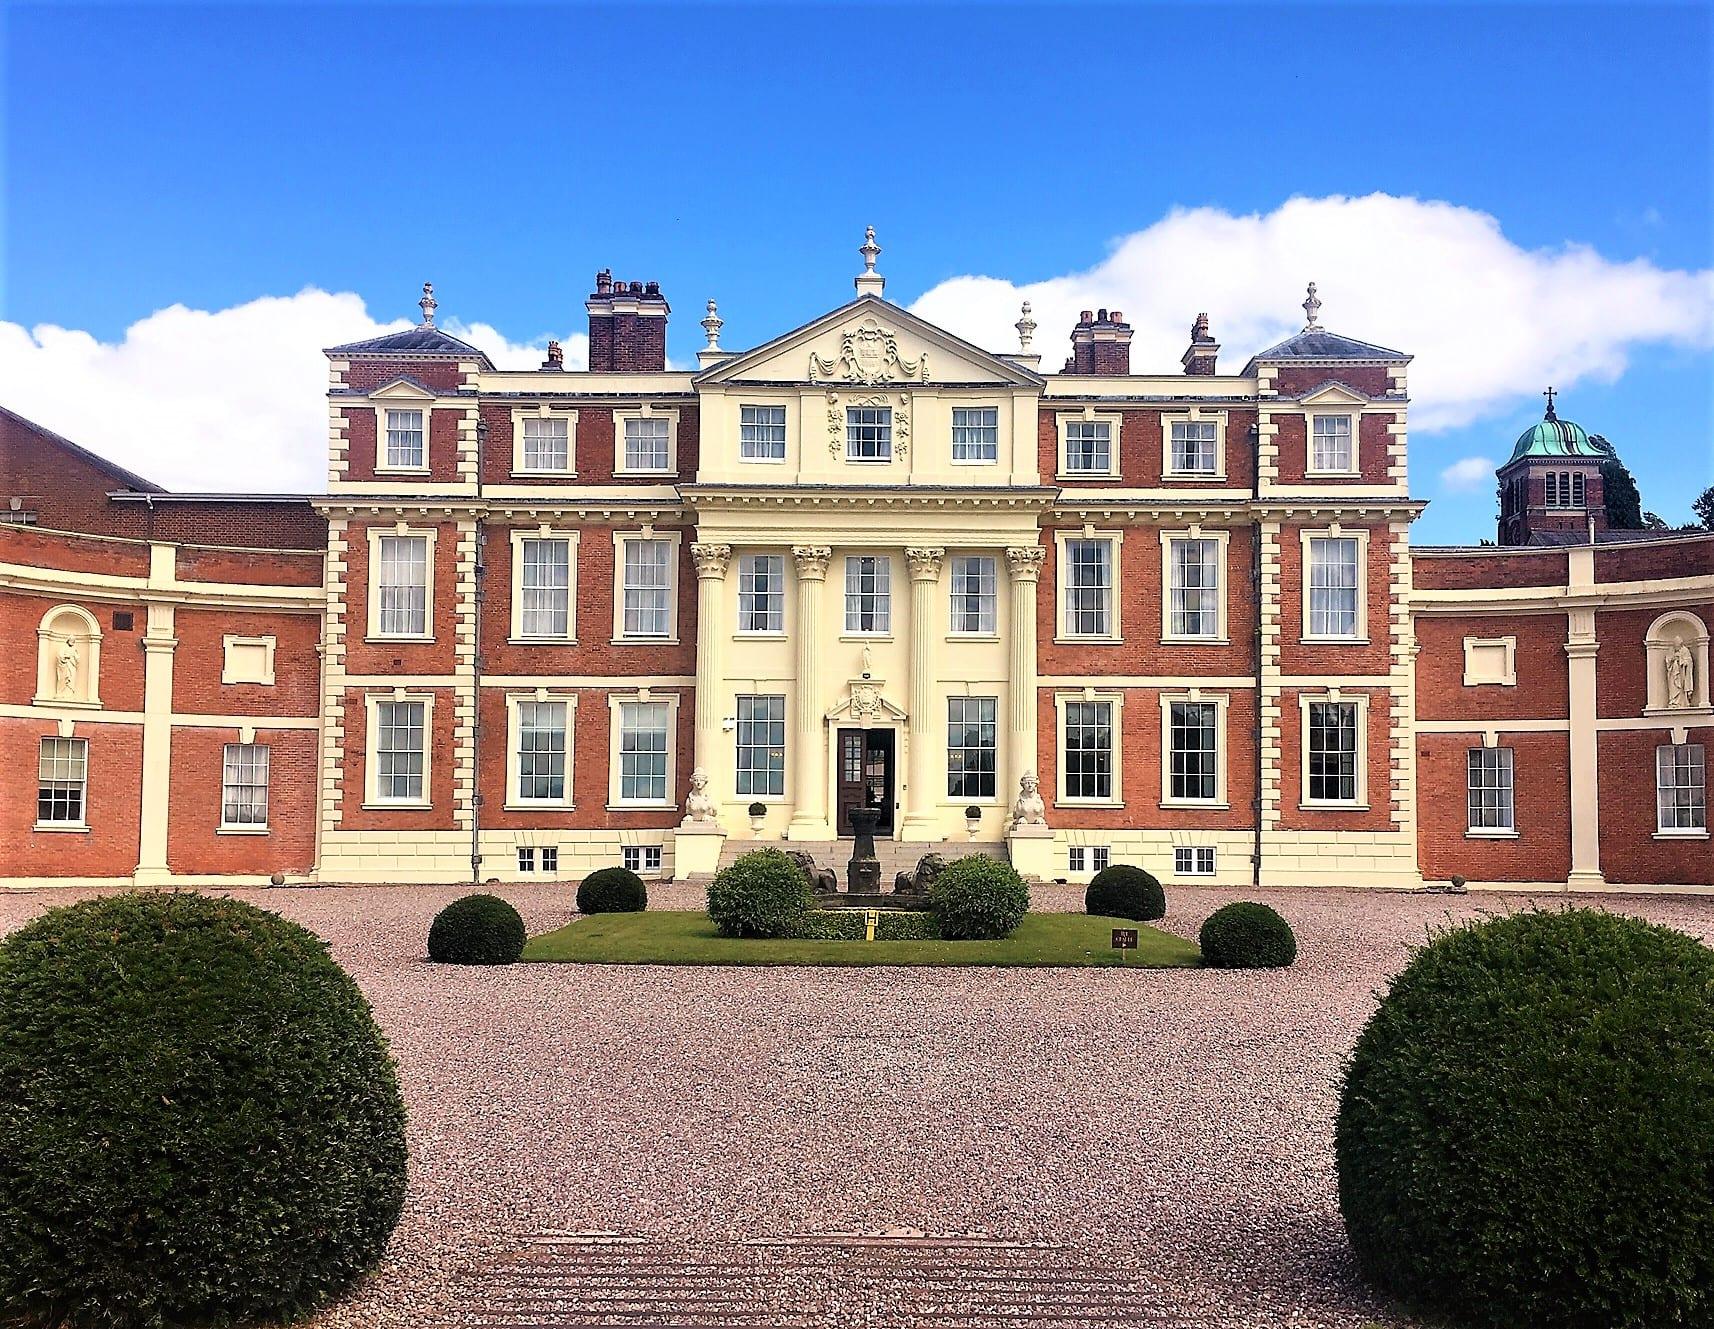 Hawkstone hall Luxury Christmas Hotel Breaks